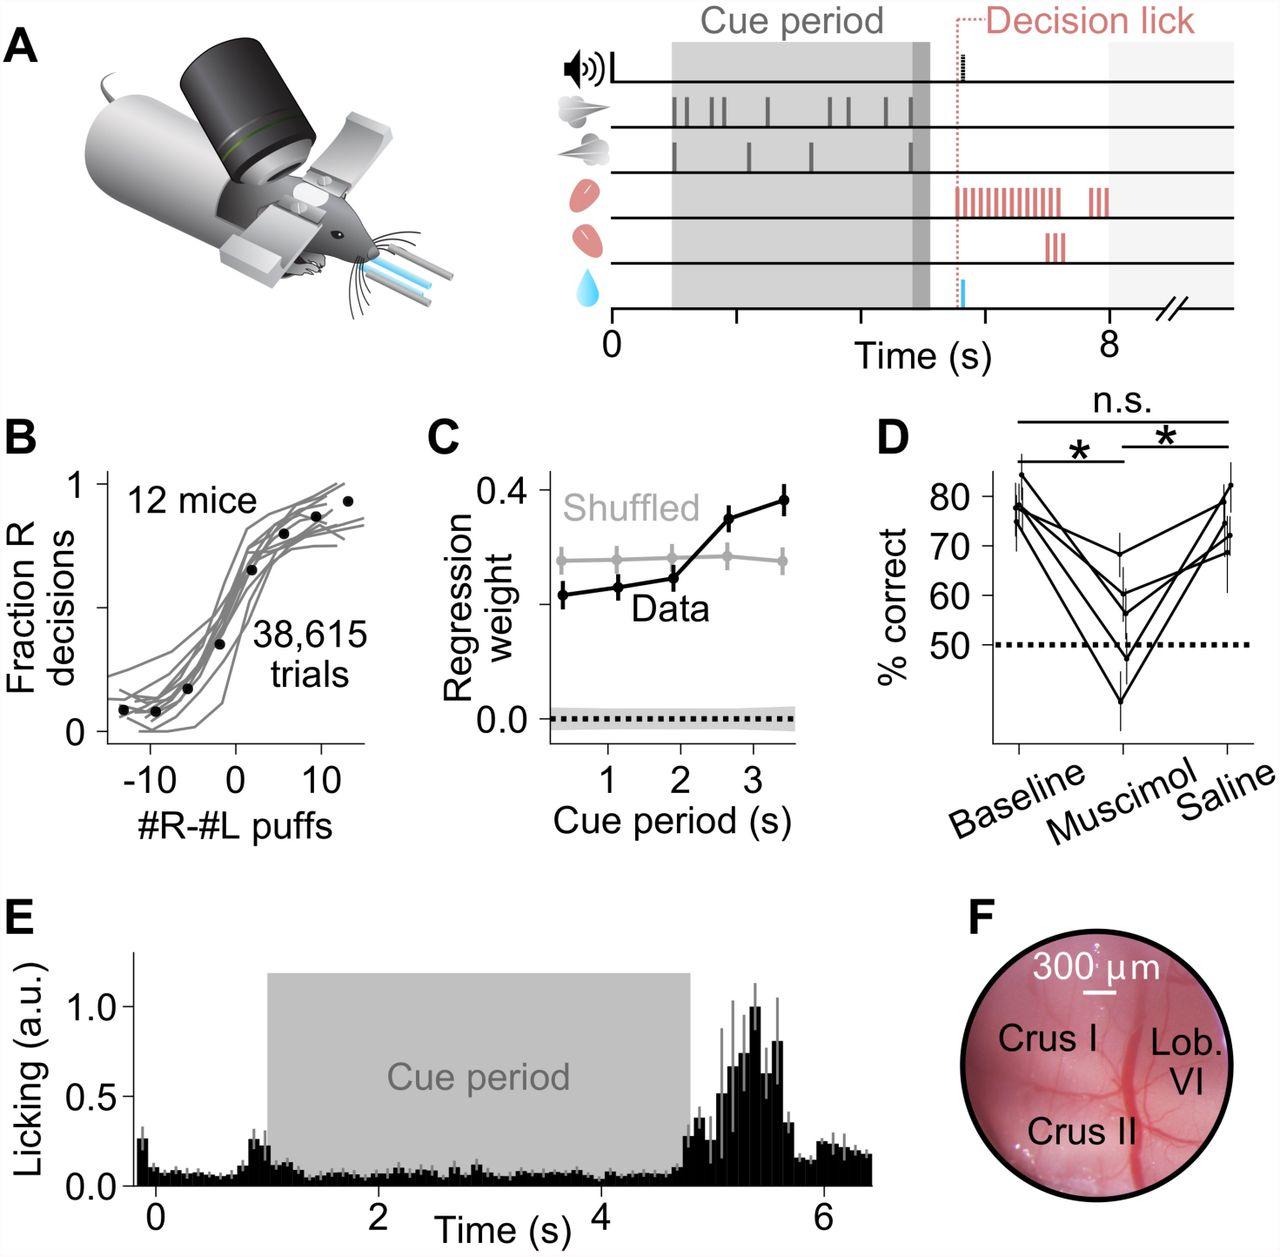 A cerebellar role in evidence-guided decision-making | bioRxiv